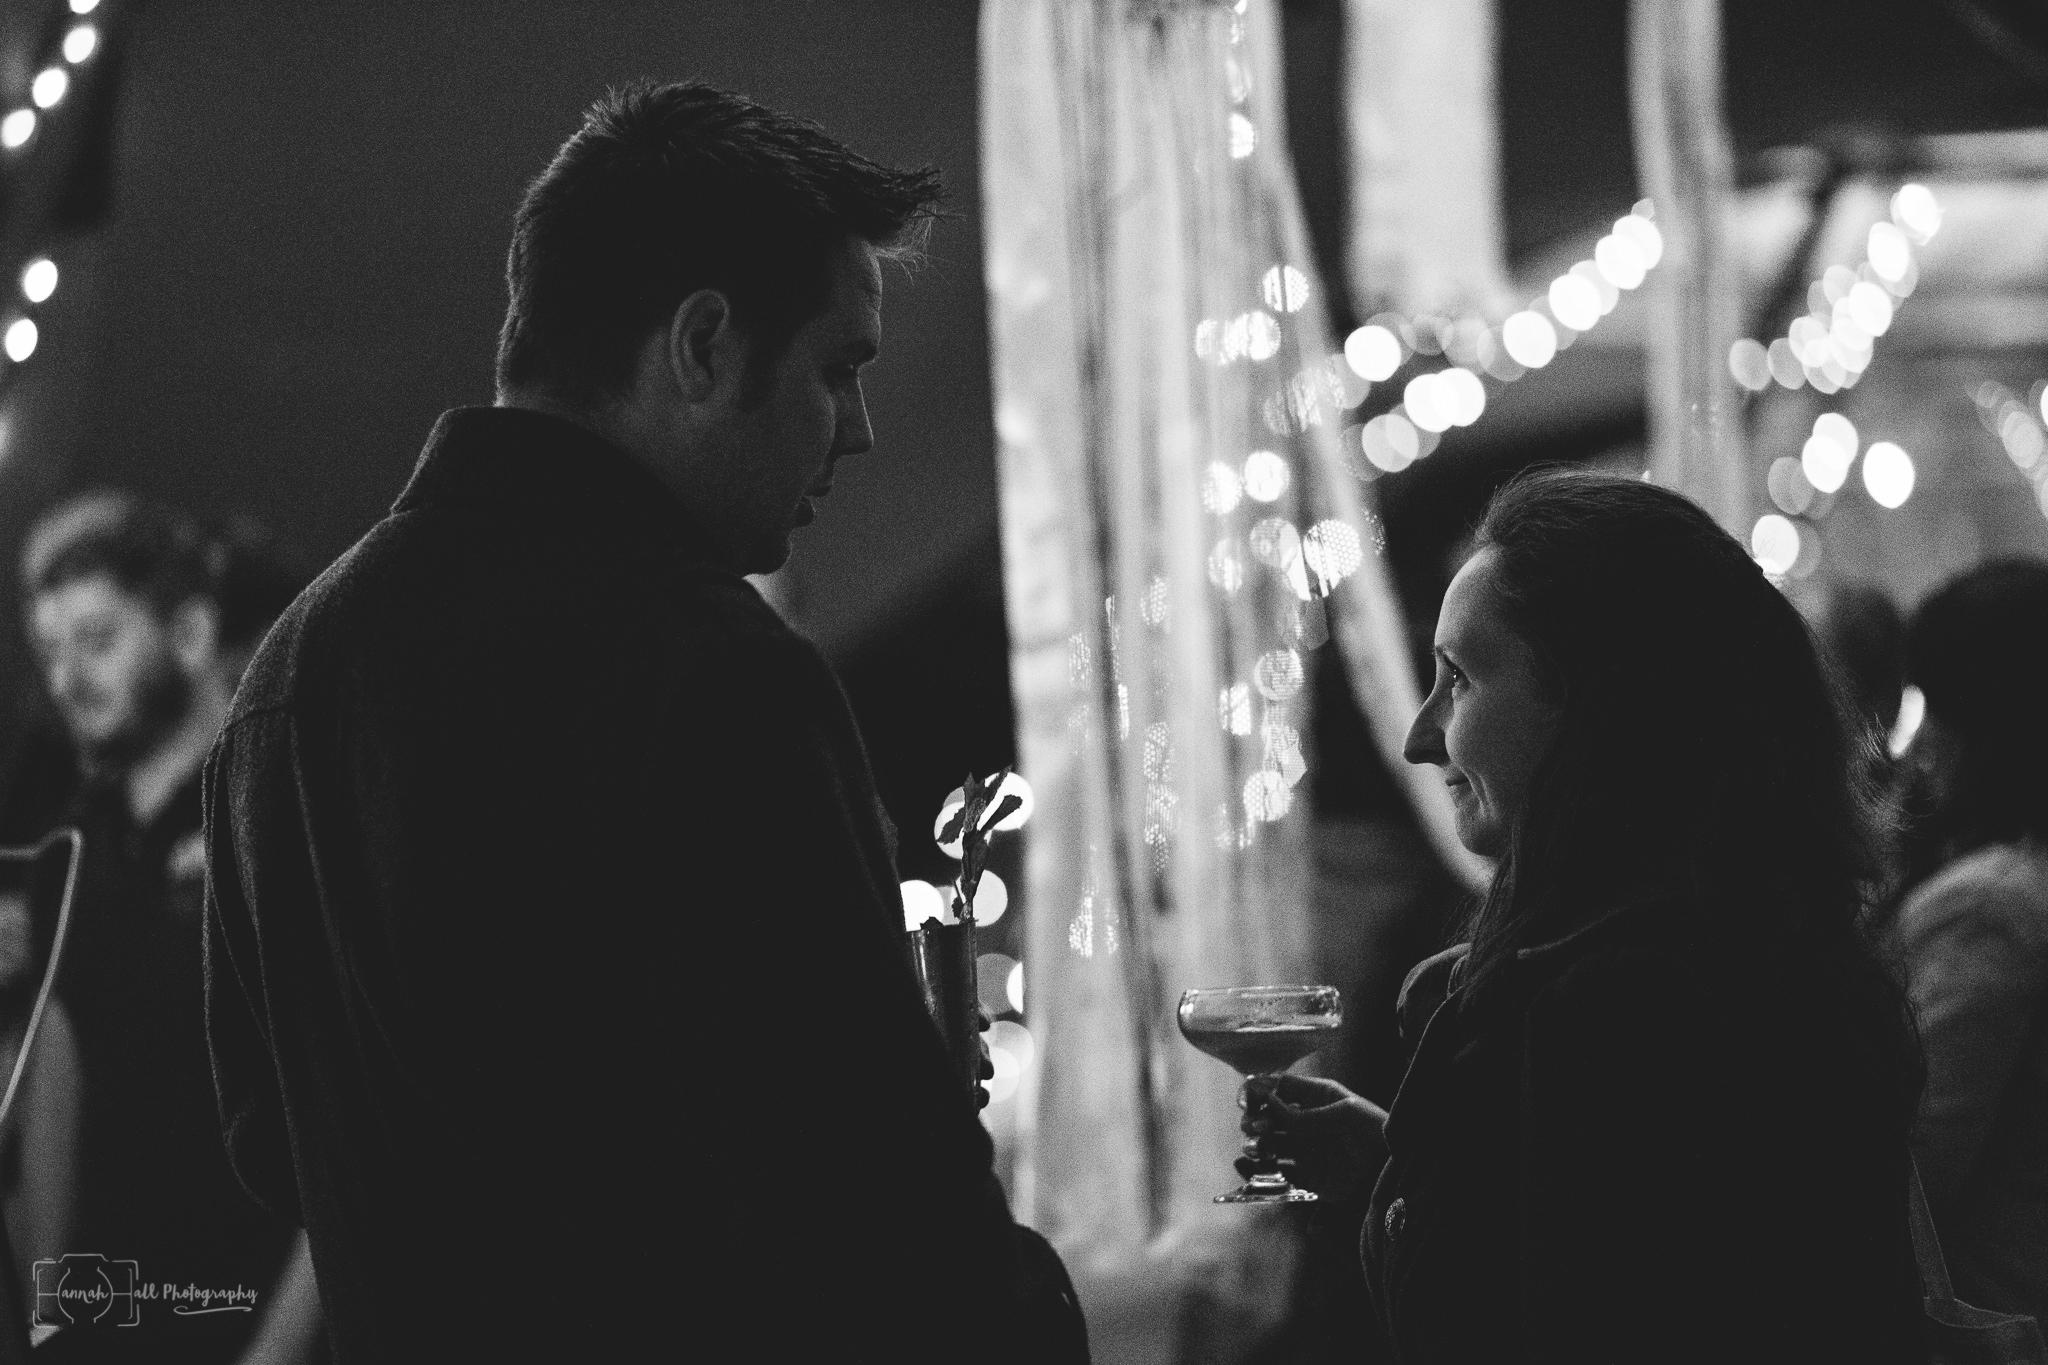 hhp_derbyshire_wedding_photographer-32